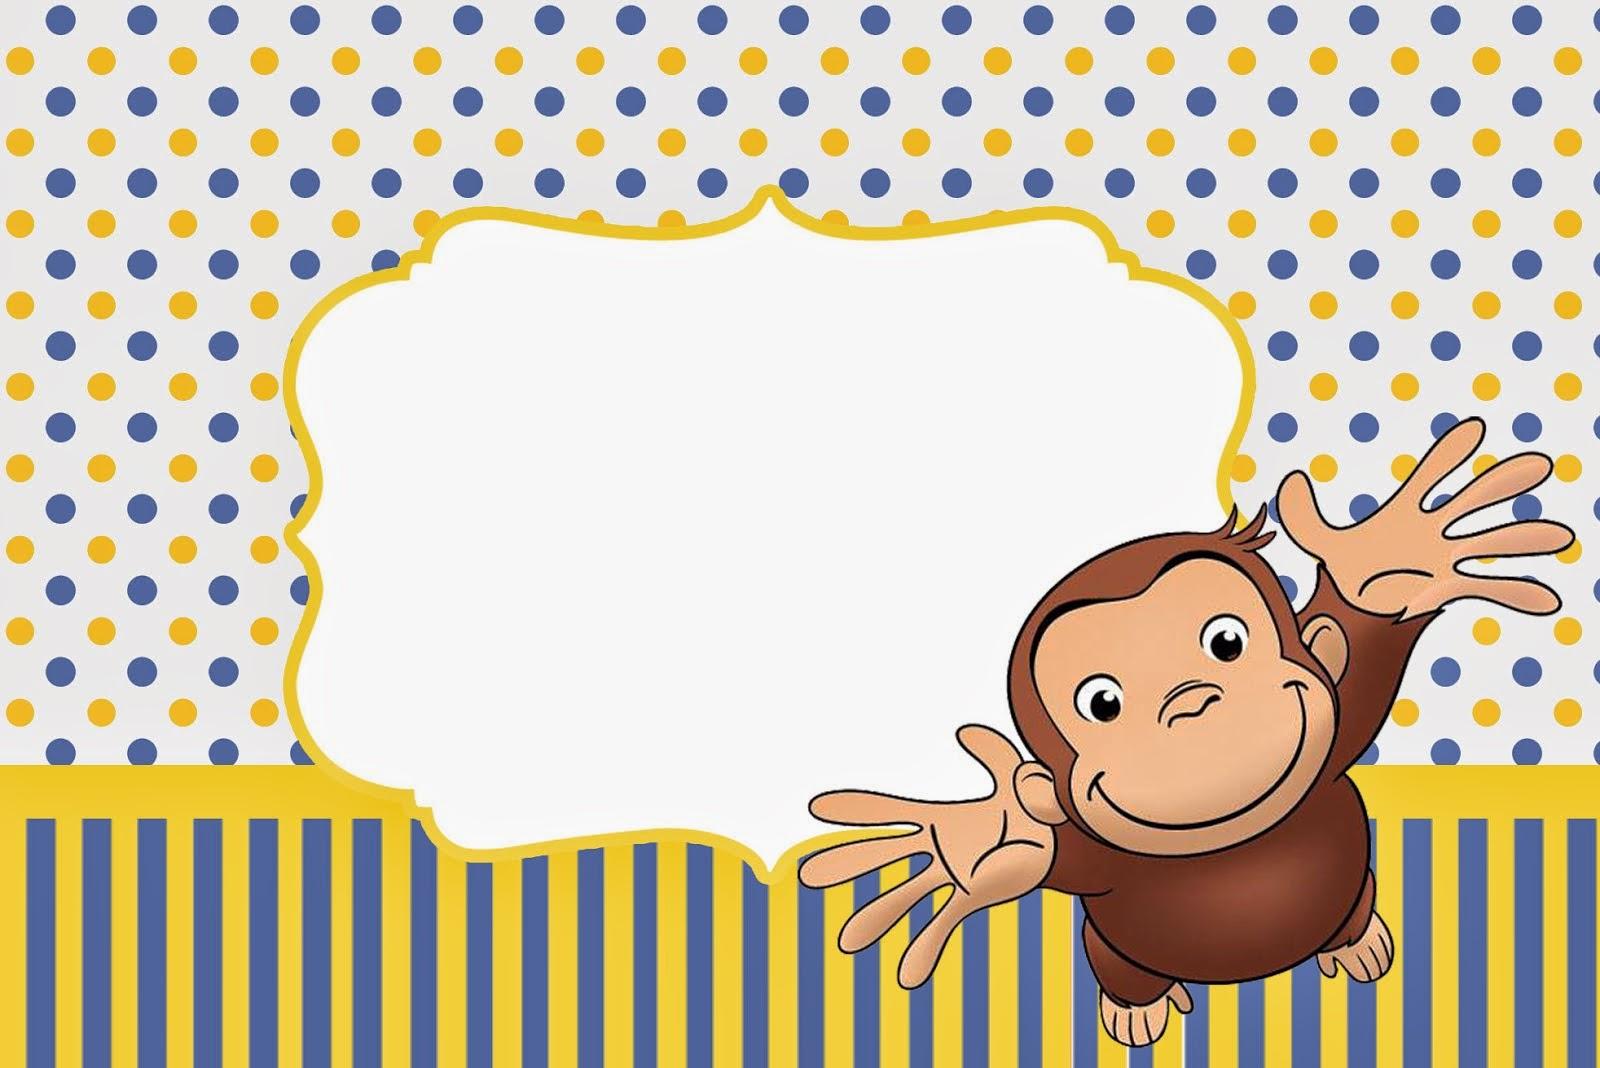 Curious George Free Printable Invitations. | Oh My Fiesta! In English - Free Printable Curious George Invitations